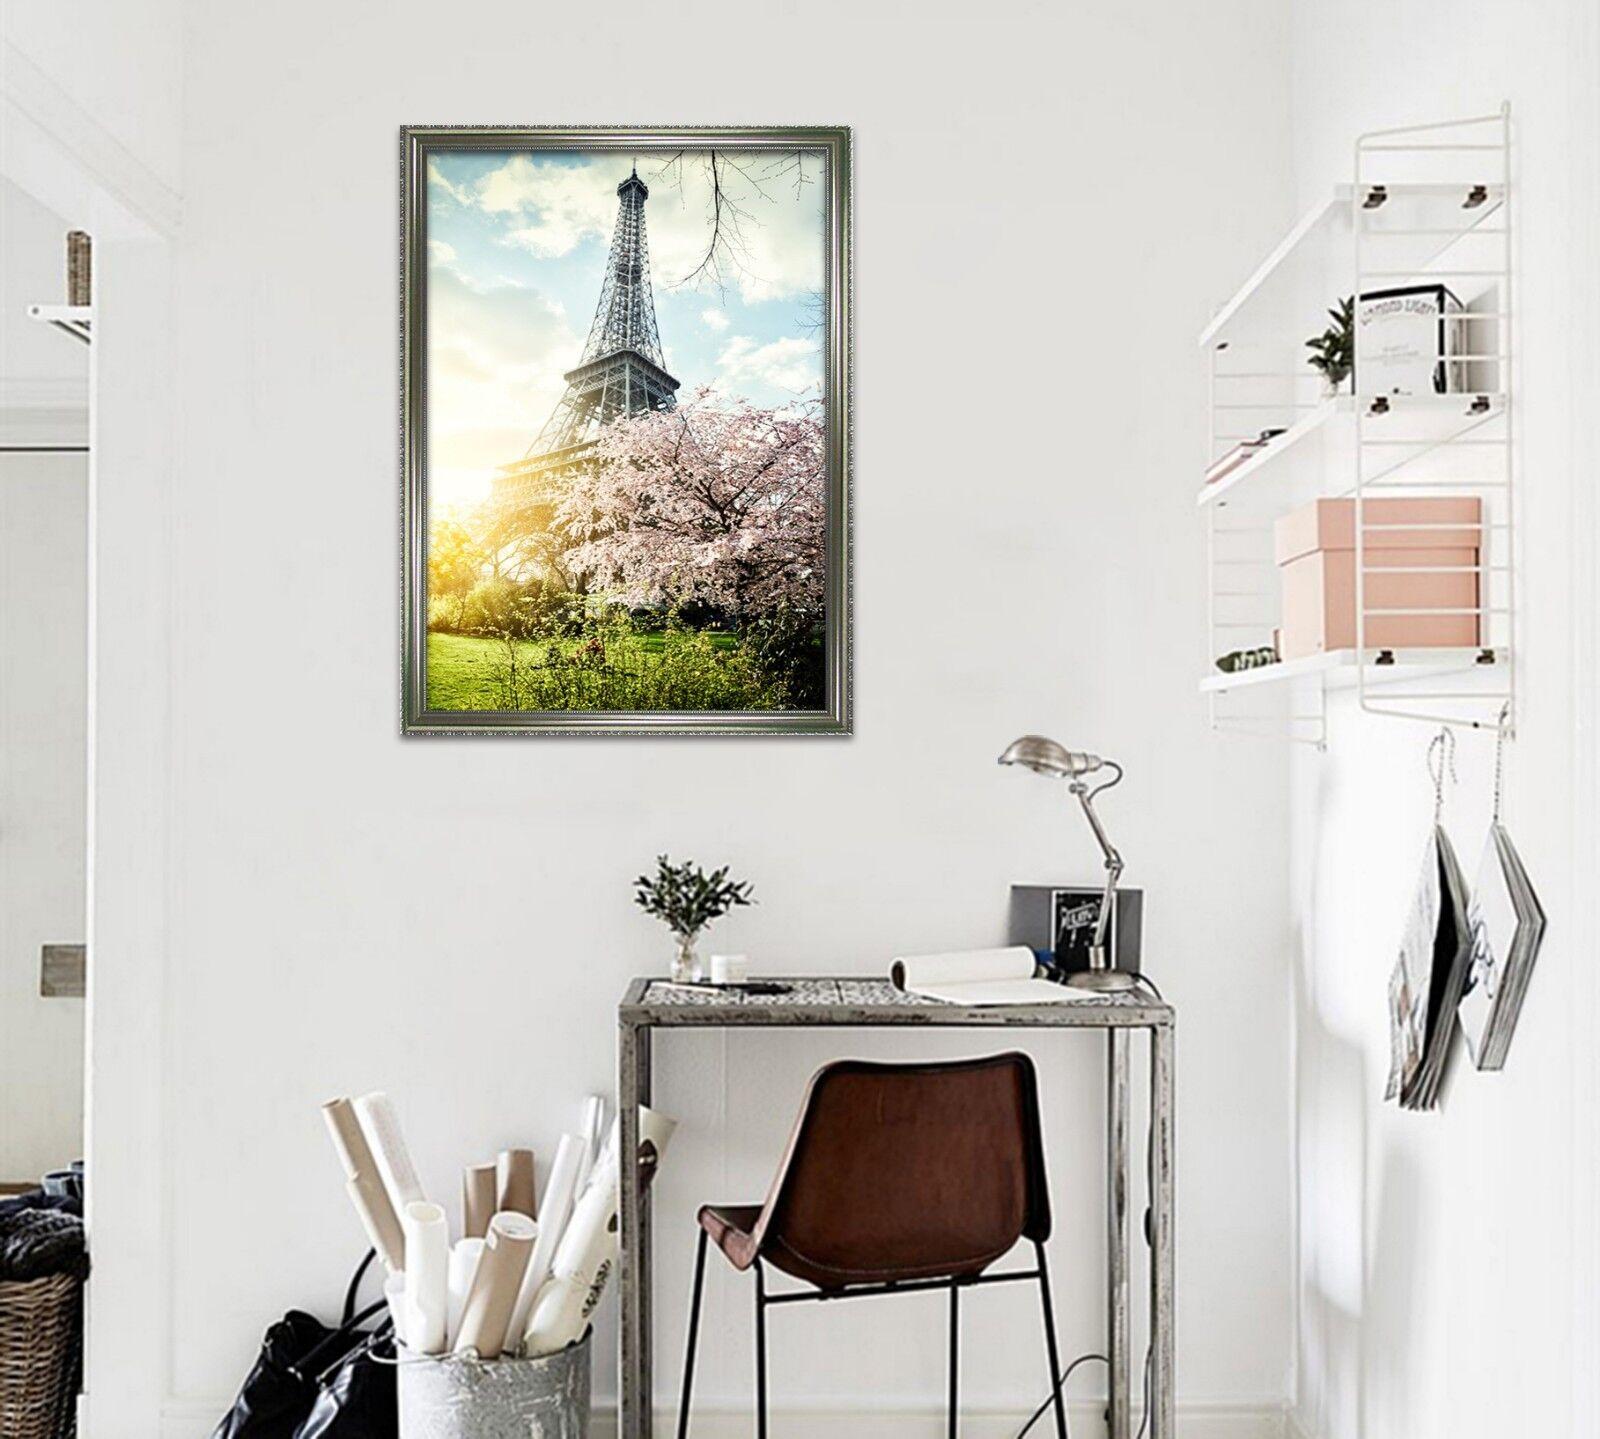 3D Torre Eiffel 3 Póster Enmarcado Paisaje Decoración del Hogar Pintura de Impresión Arte Wallpaper